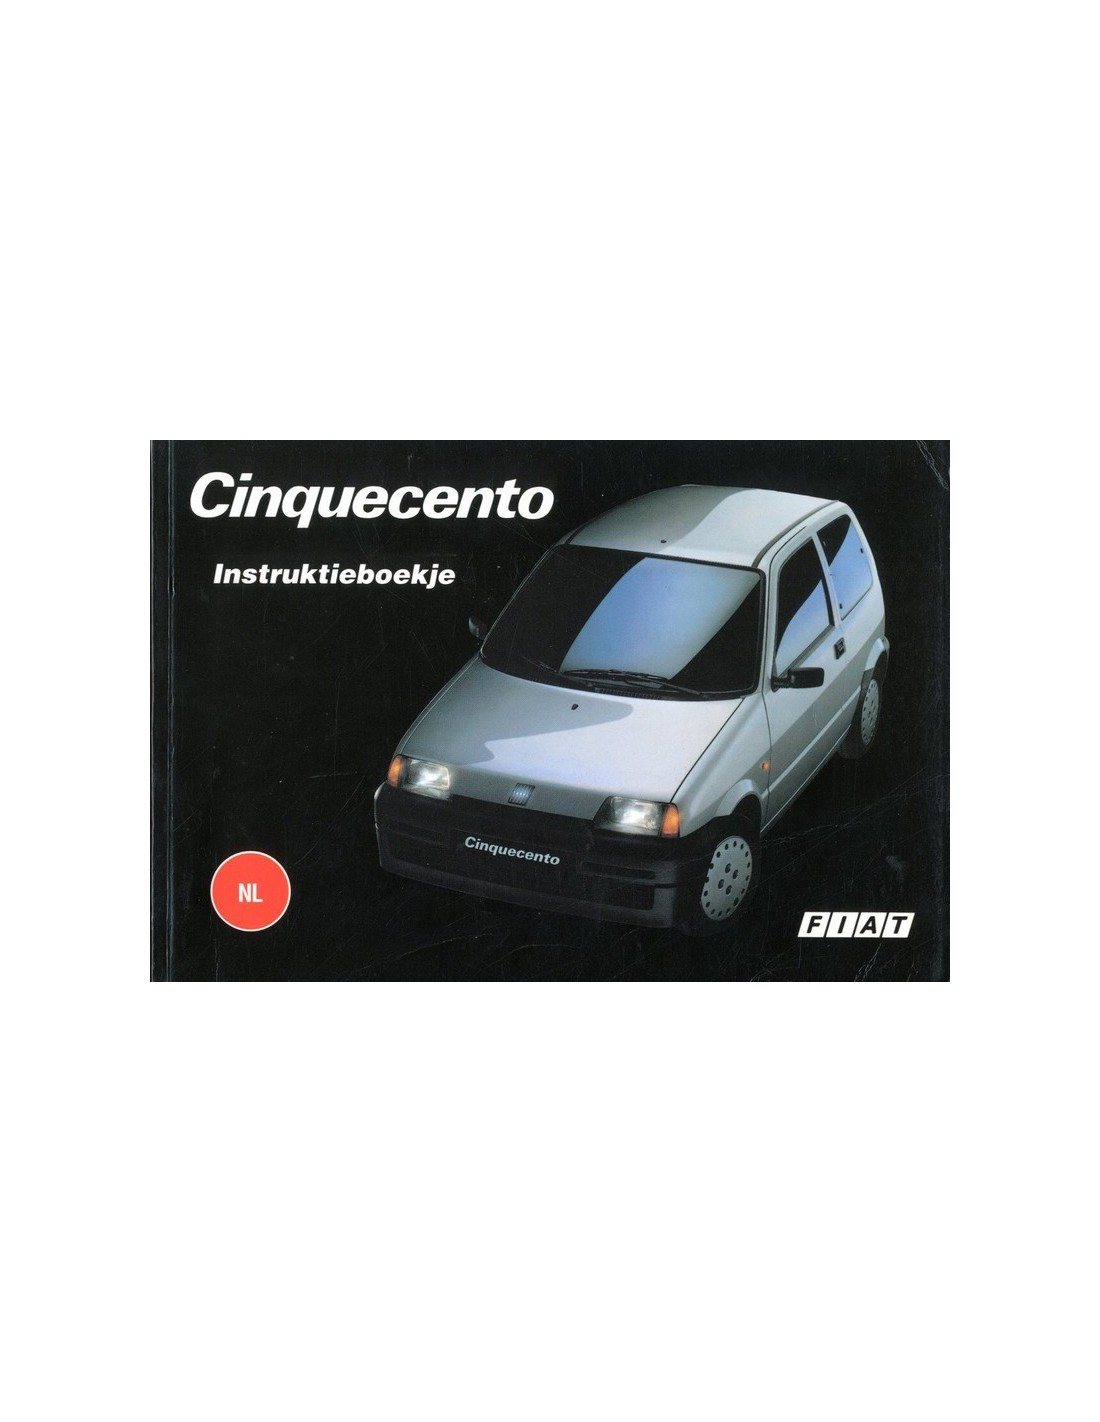 1995 fiat cinquecento owners manual dutch rh autolit eu 2013 Fiat 500 Fiat 500